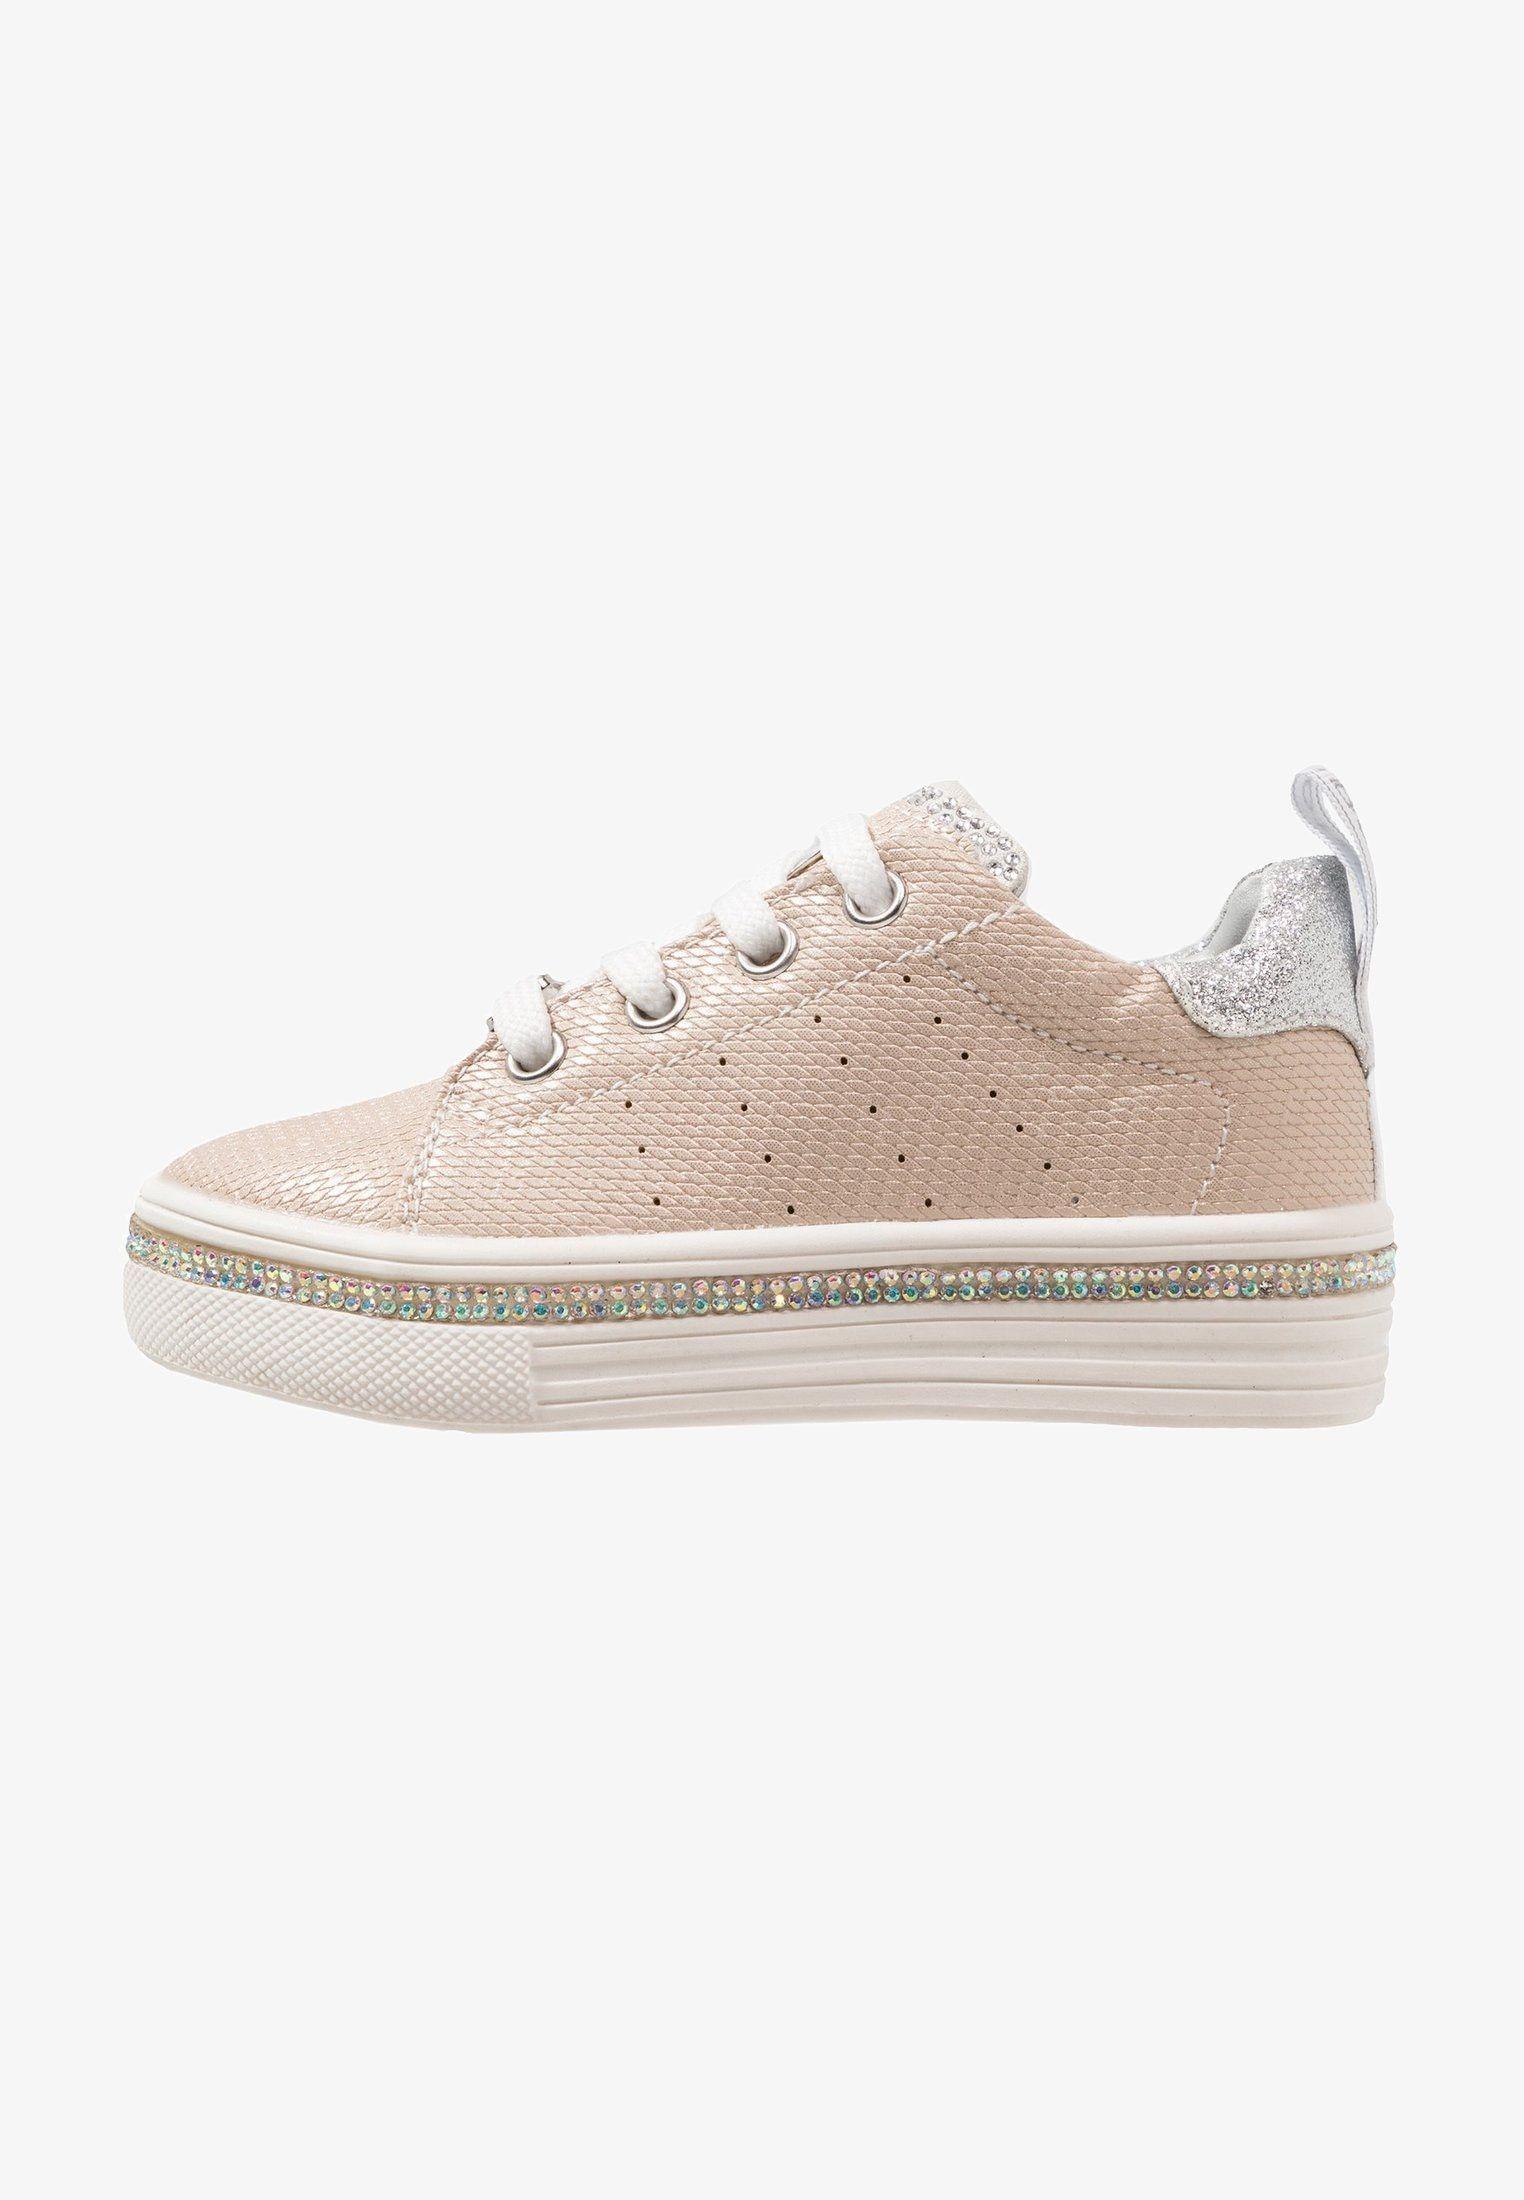 Laura Biagiotti Sneaker Low Pink Zalando De Laura Biagiotti Sneaker Kunstleder